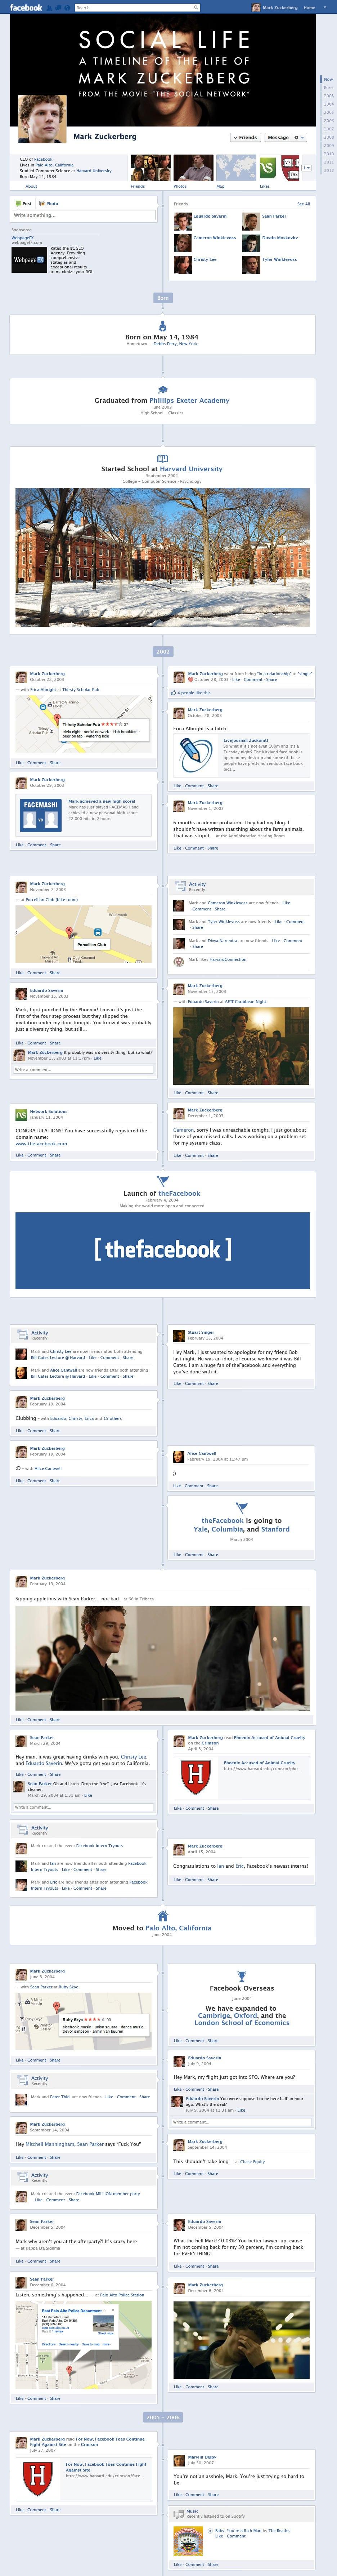 The Facebook Timeline of Mark Zuckerberg